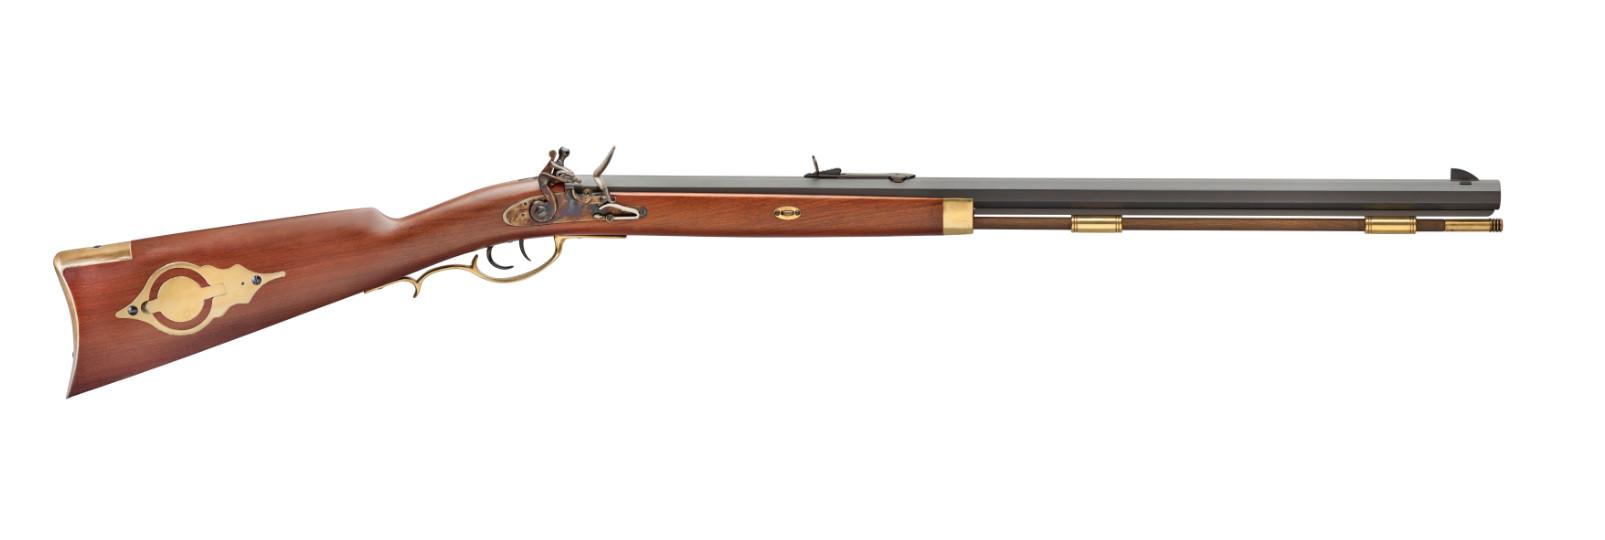 Traditional Hawken Target Rifle flintlock model